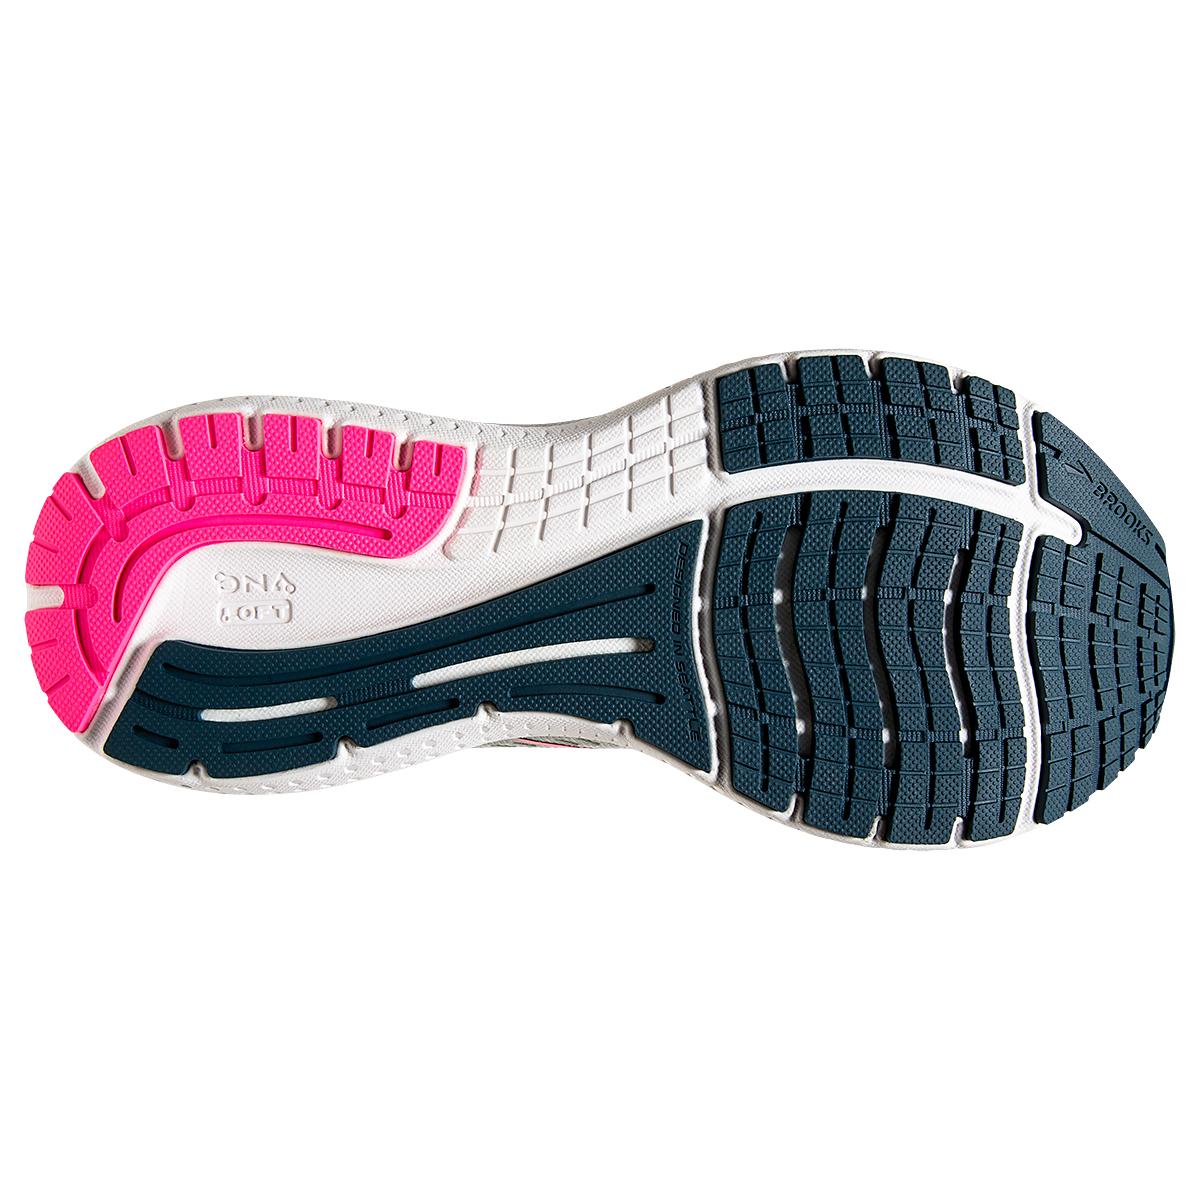 Women's Brooks Glycerin 19 Running Shoe - Color: Ice Flow/Navy - Size: 5 - Width: Regular, Ice Flow/Navy, large, image 3